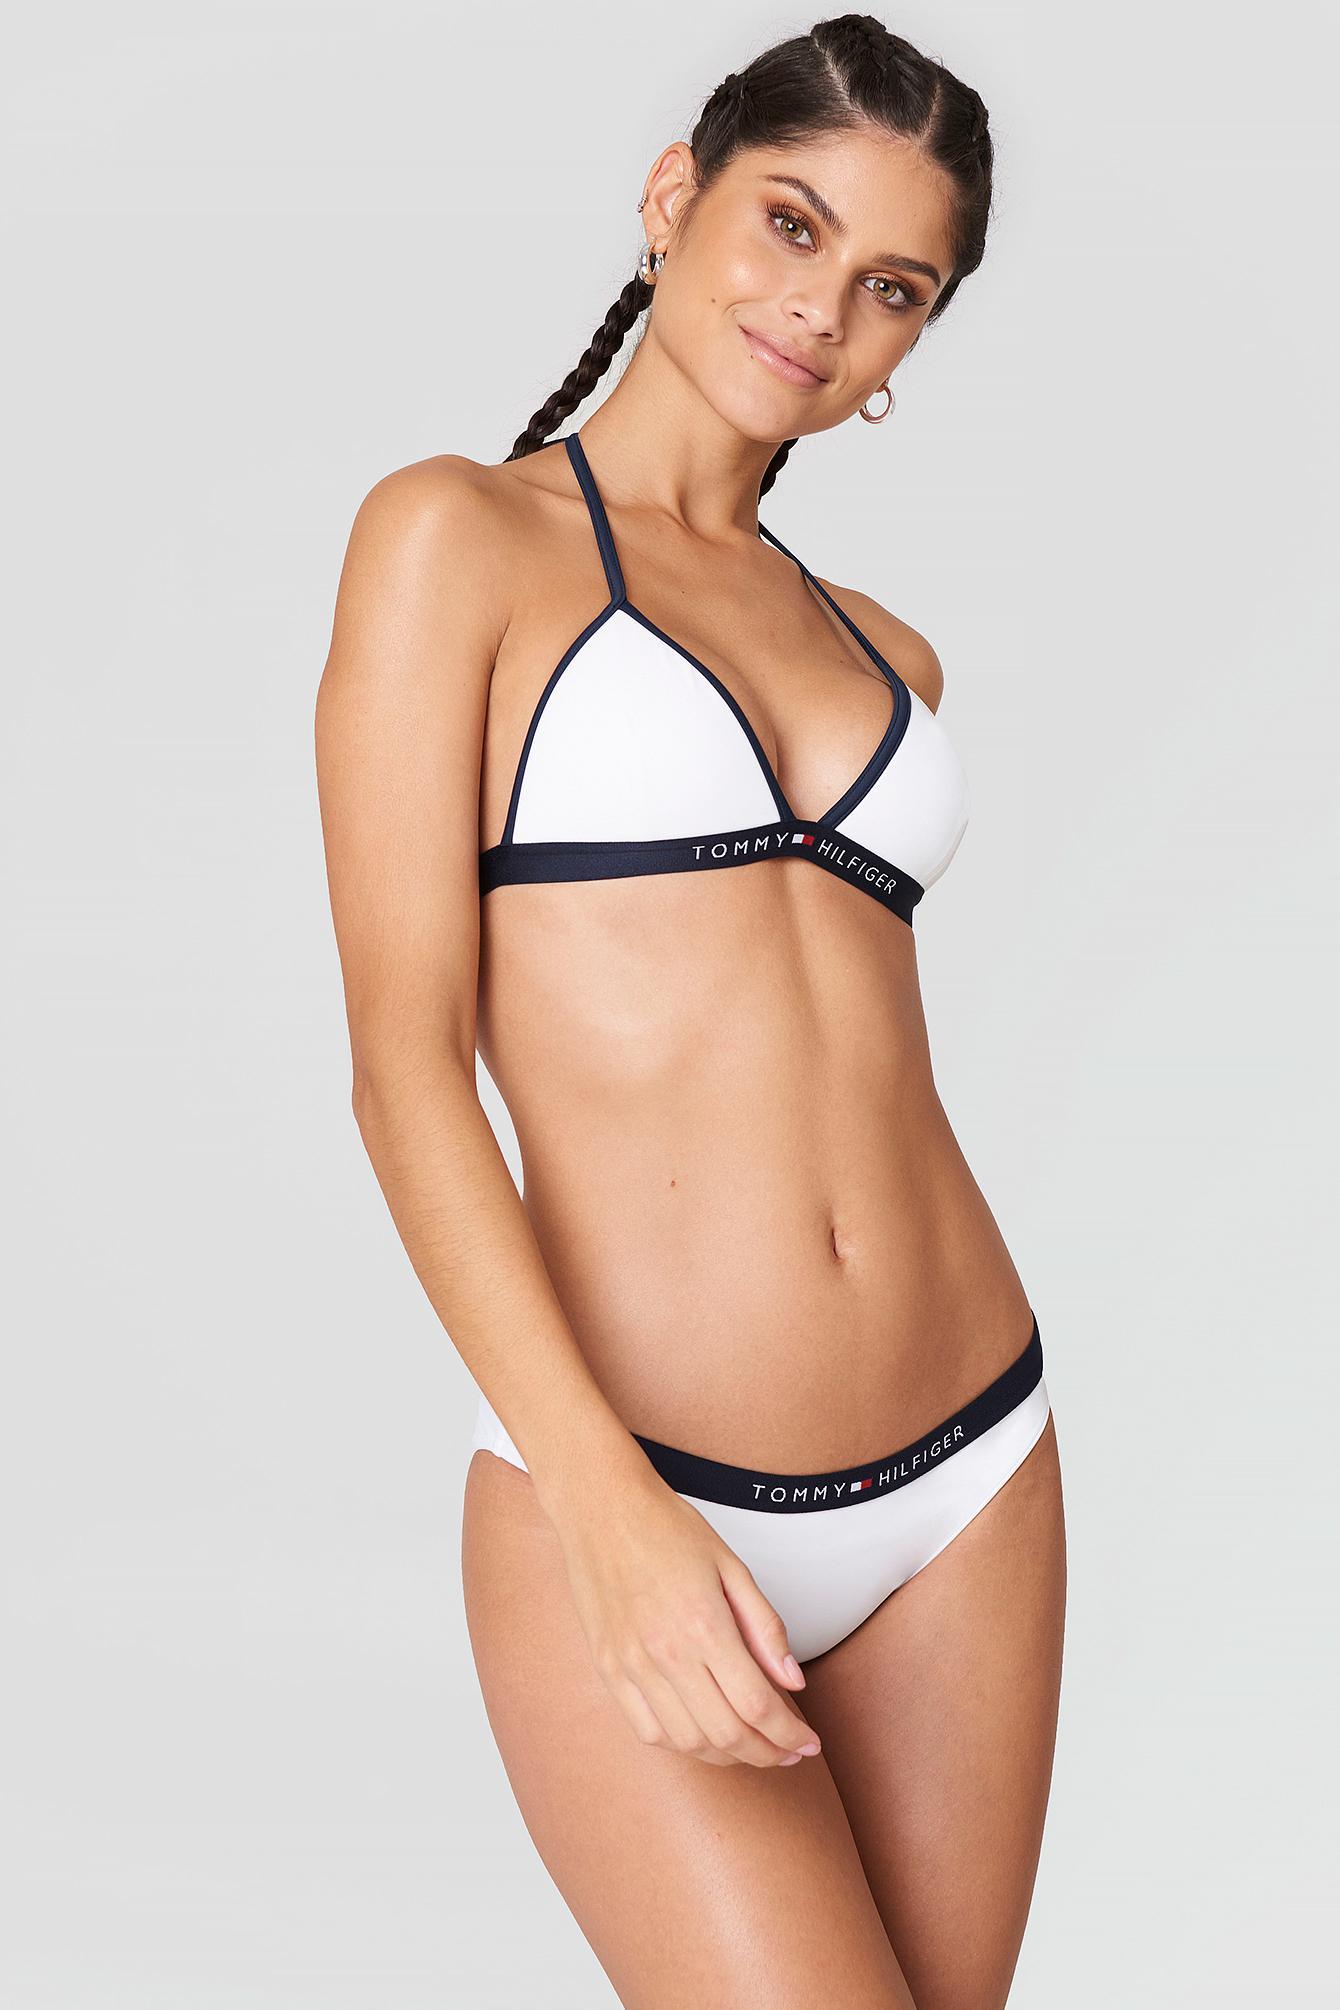 762816f7f8491 Lyst - Tommy Hilfiger Bikini Bottom Bright White in White